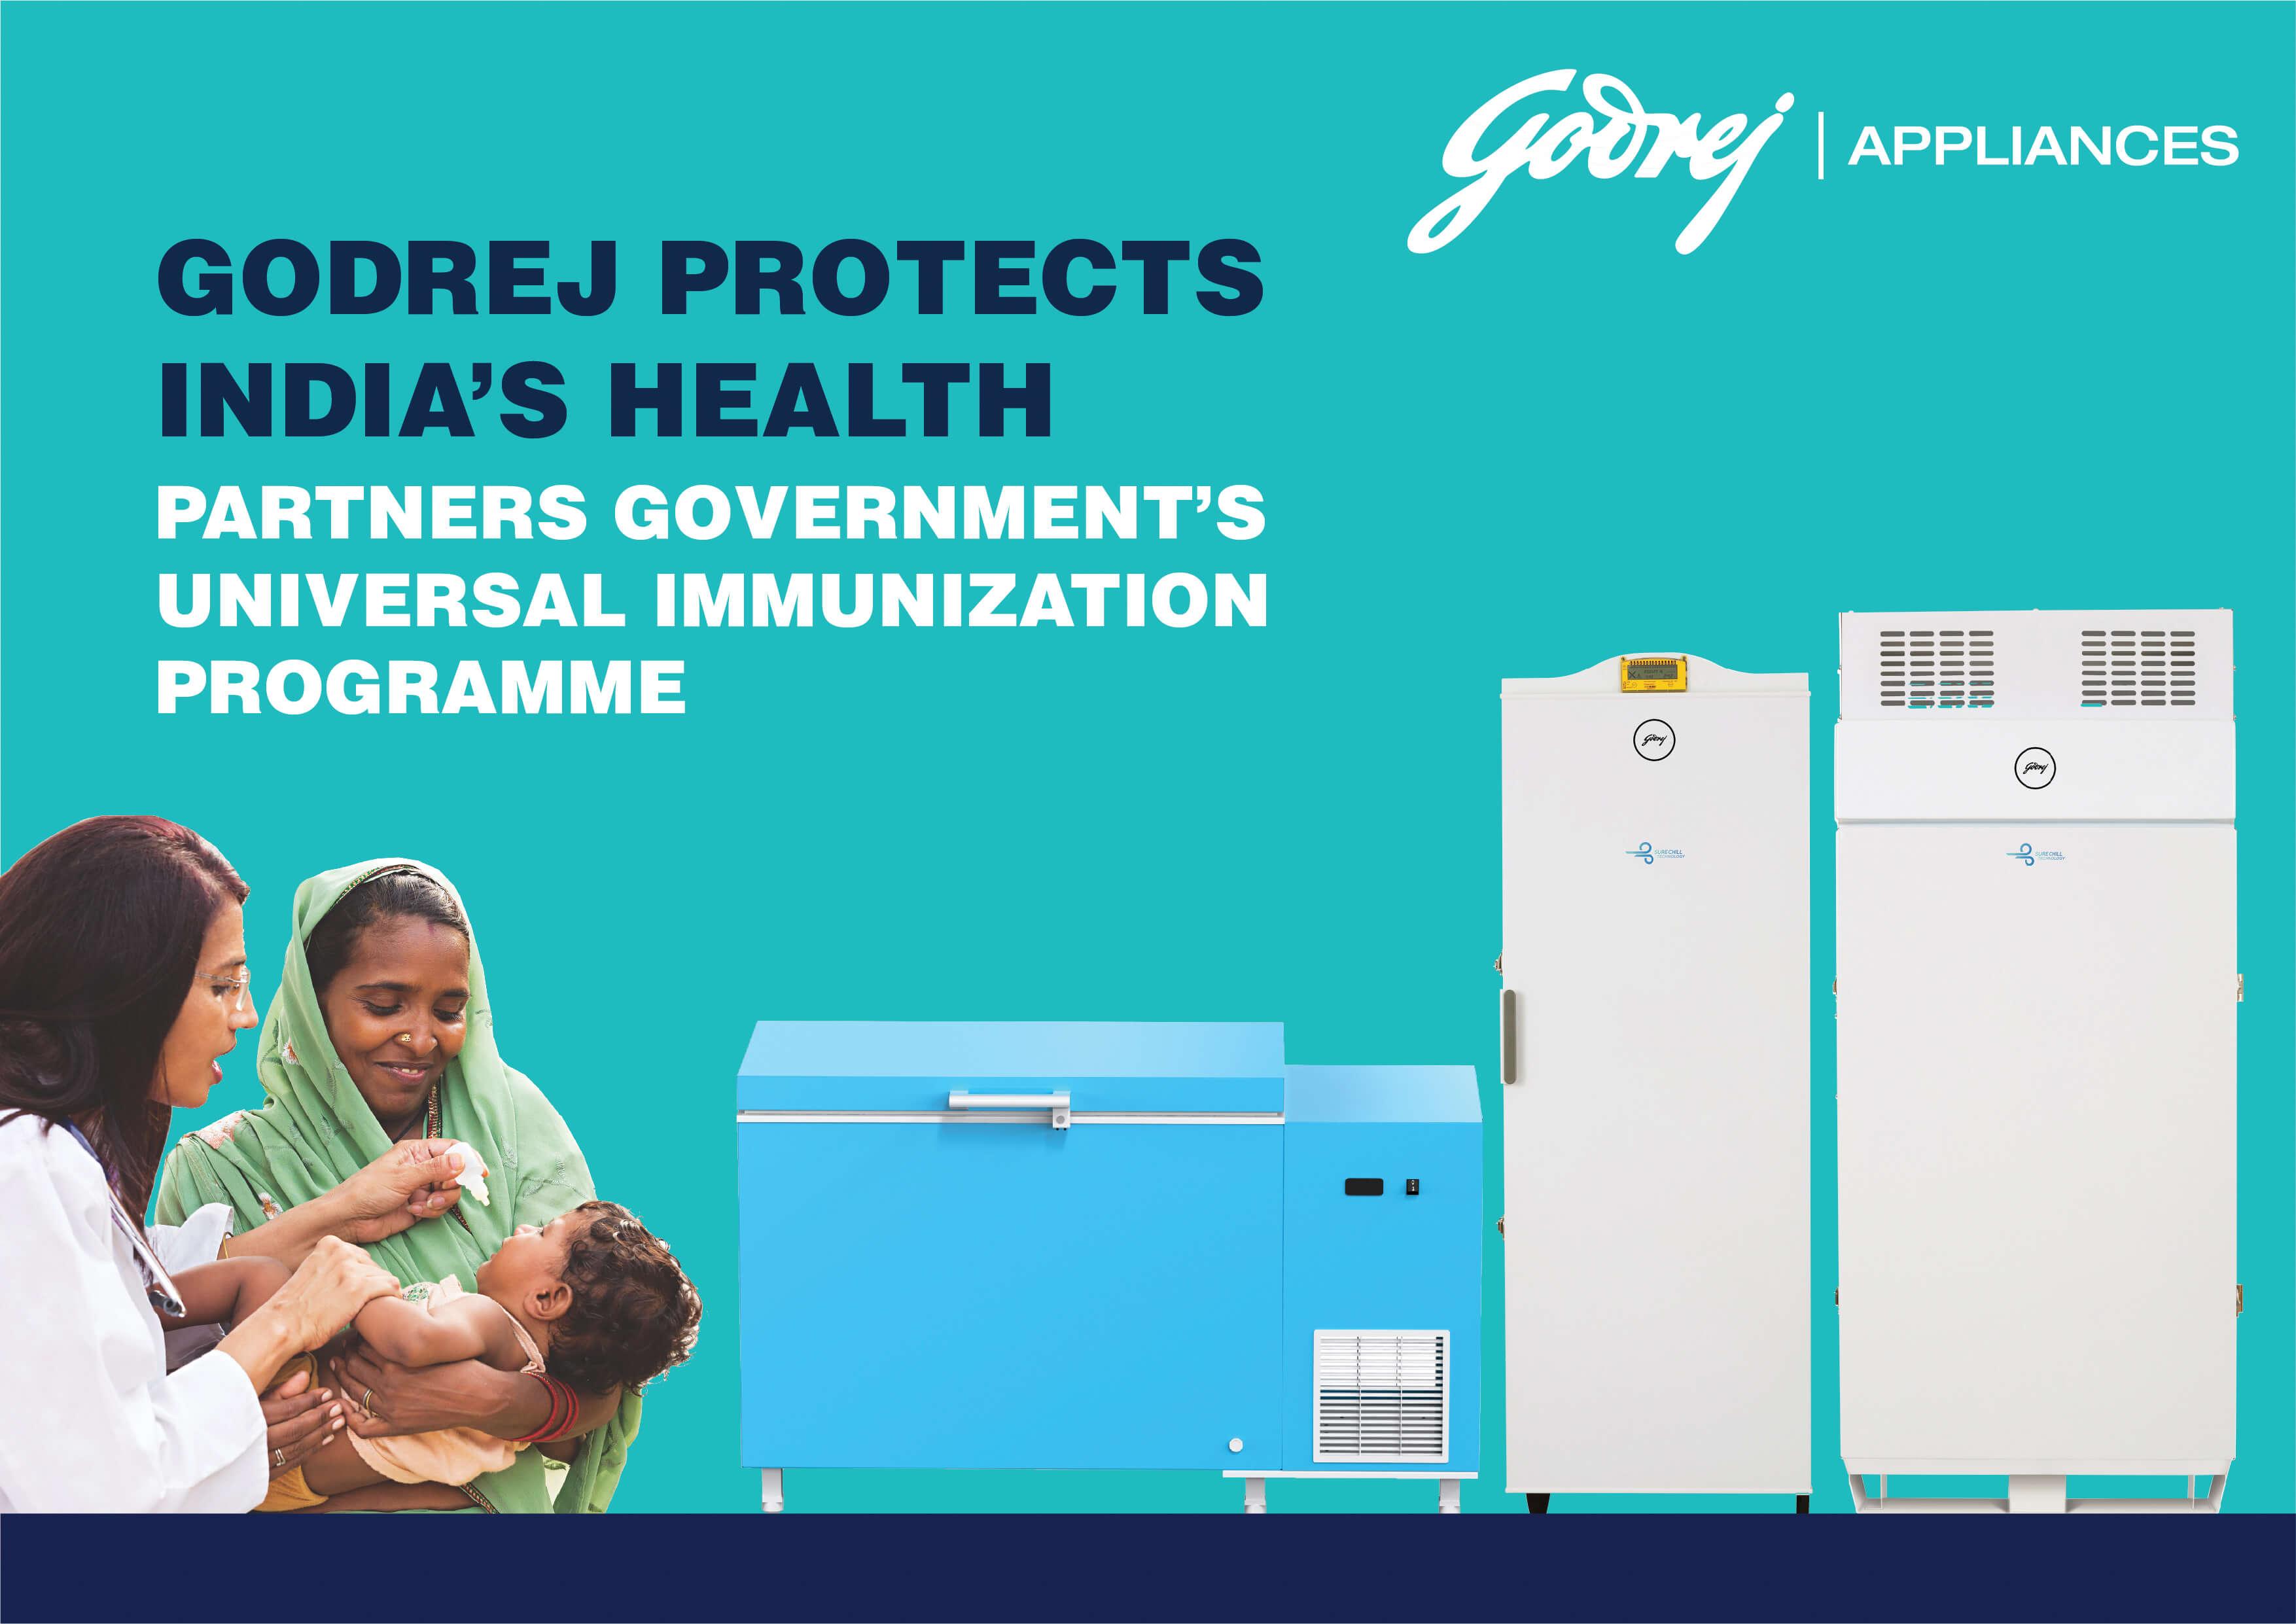 Godrej Appliances protects Indias health